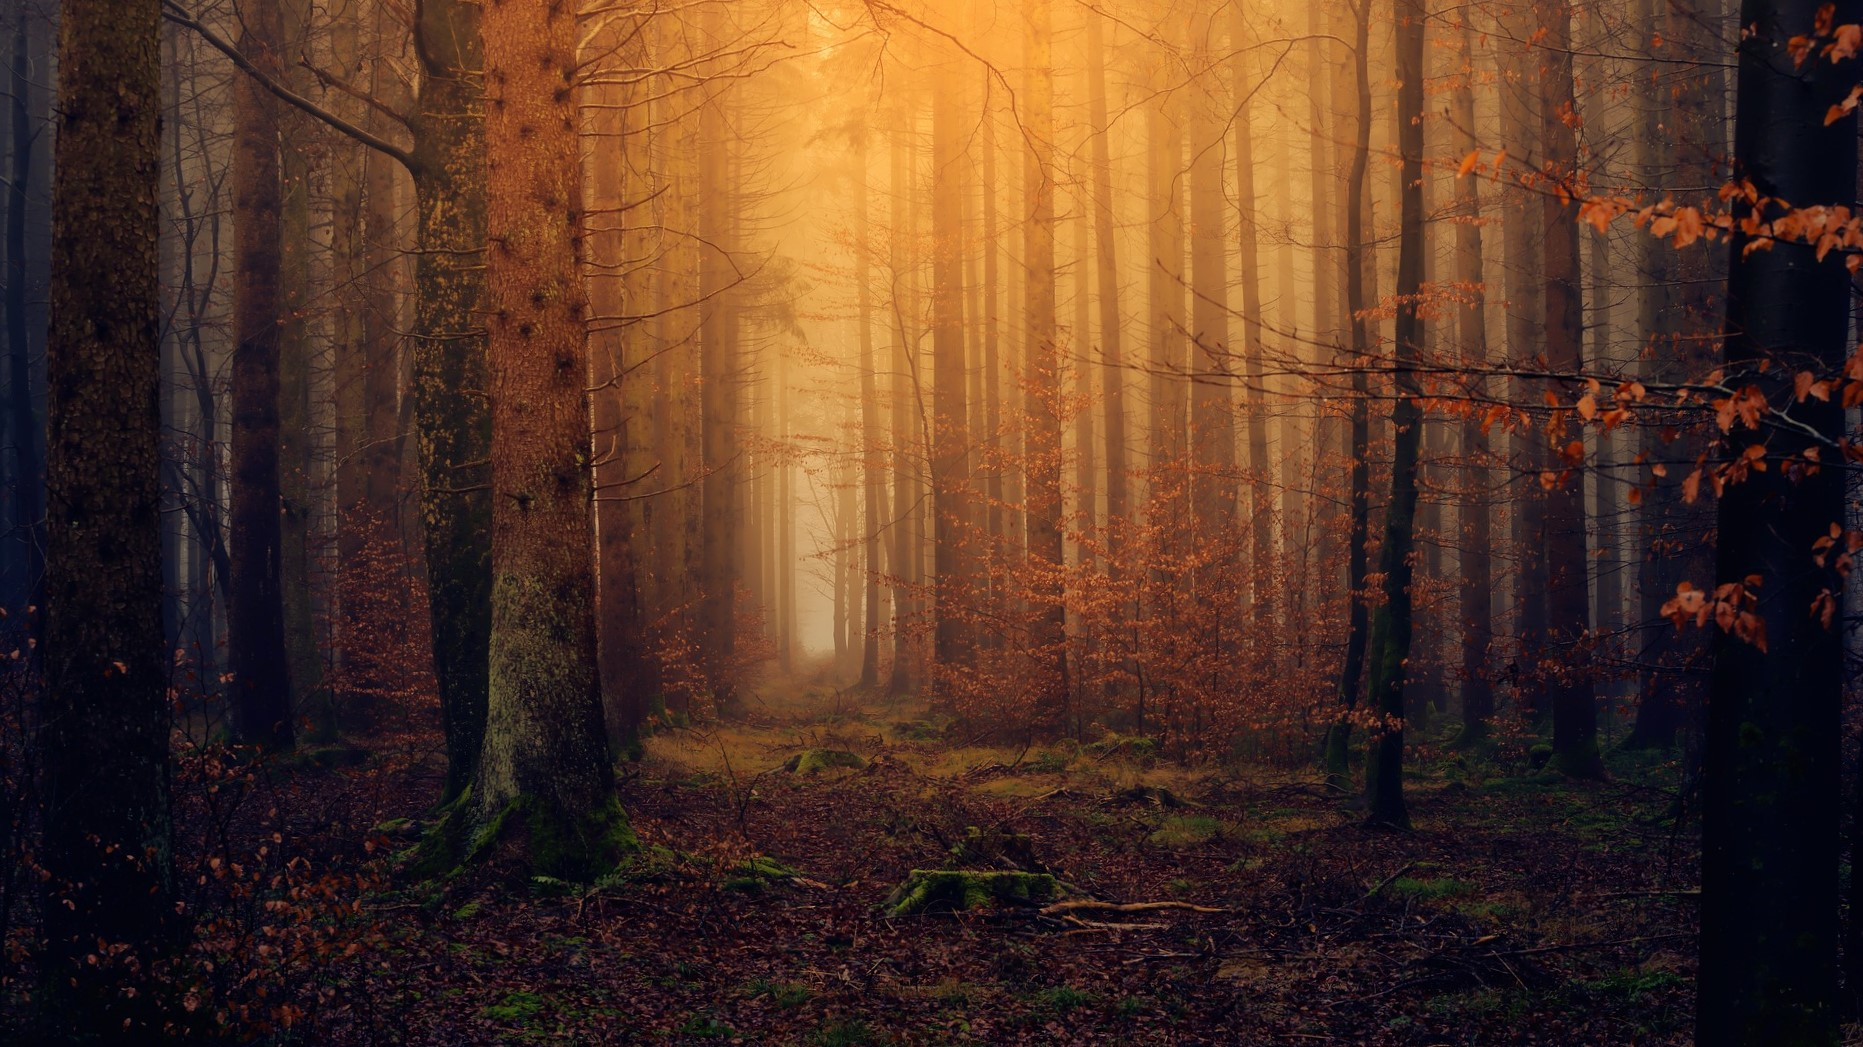 forest-3119826_1920 edit.jpg